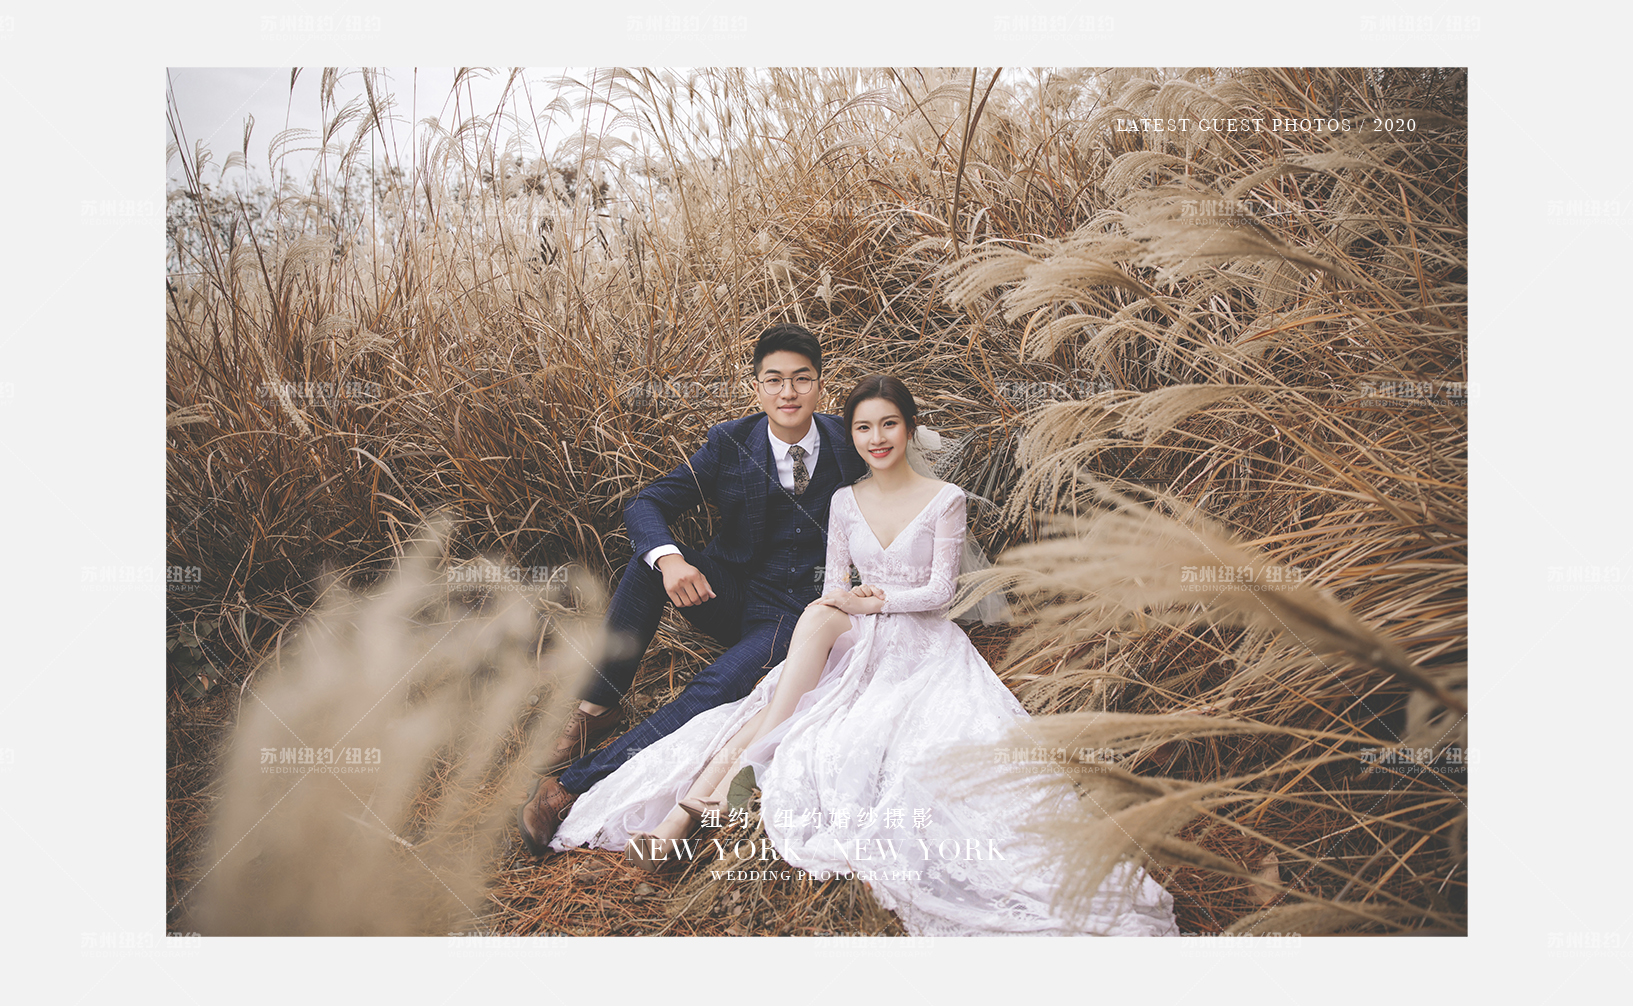 Mr.叶 & Ms.梁(纽约纽约最新客照)婚纱摄影照